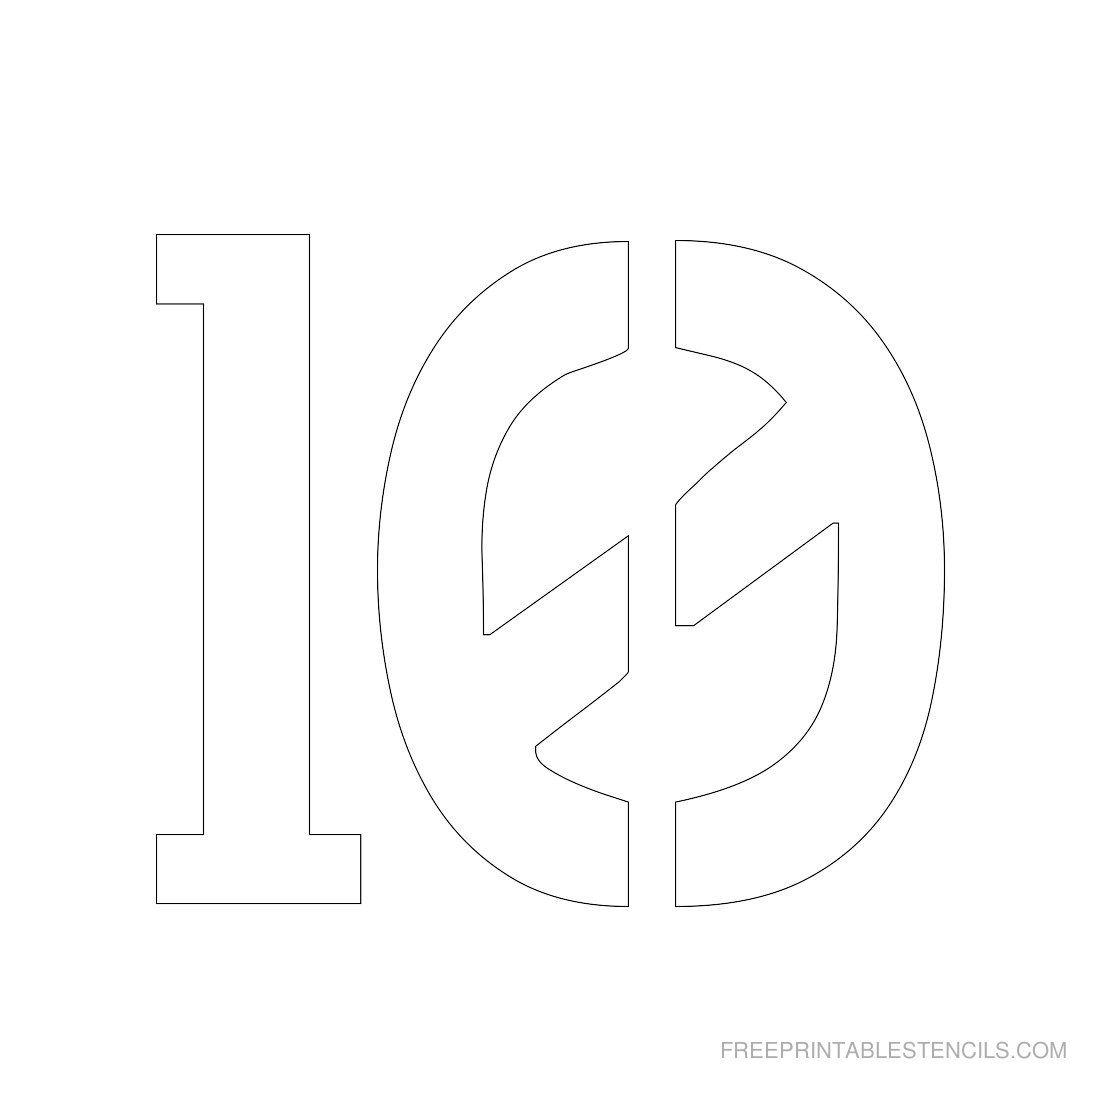 Printable 3 Inch Number Stencils 1 10 Free Com